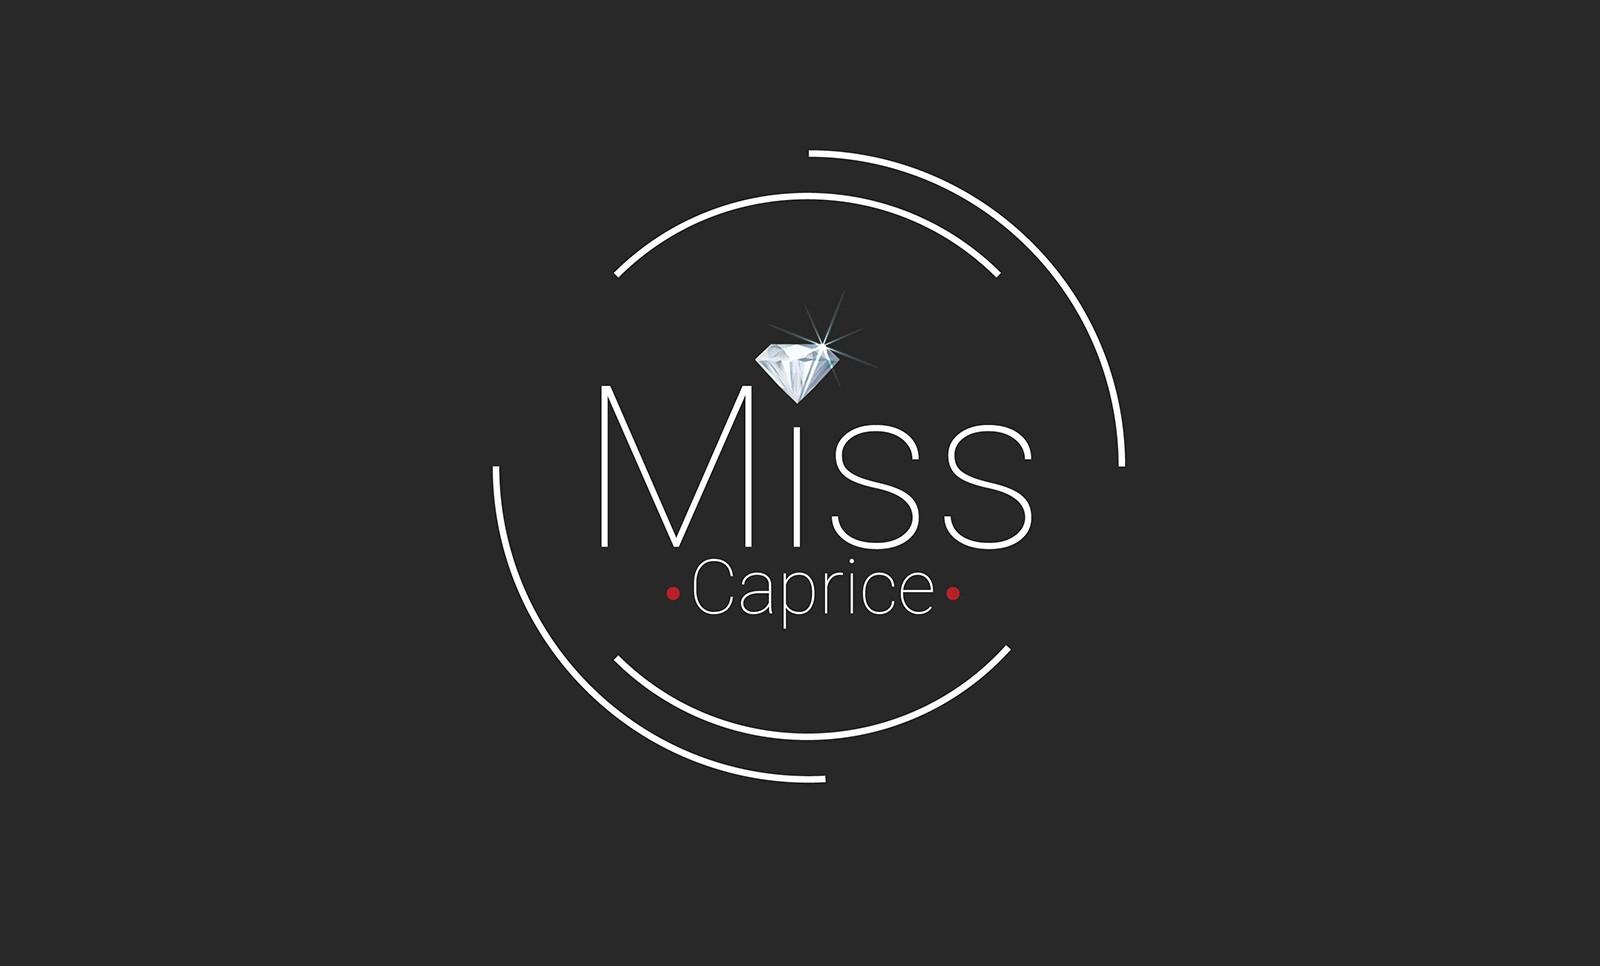 logo-miss-caprice